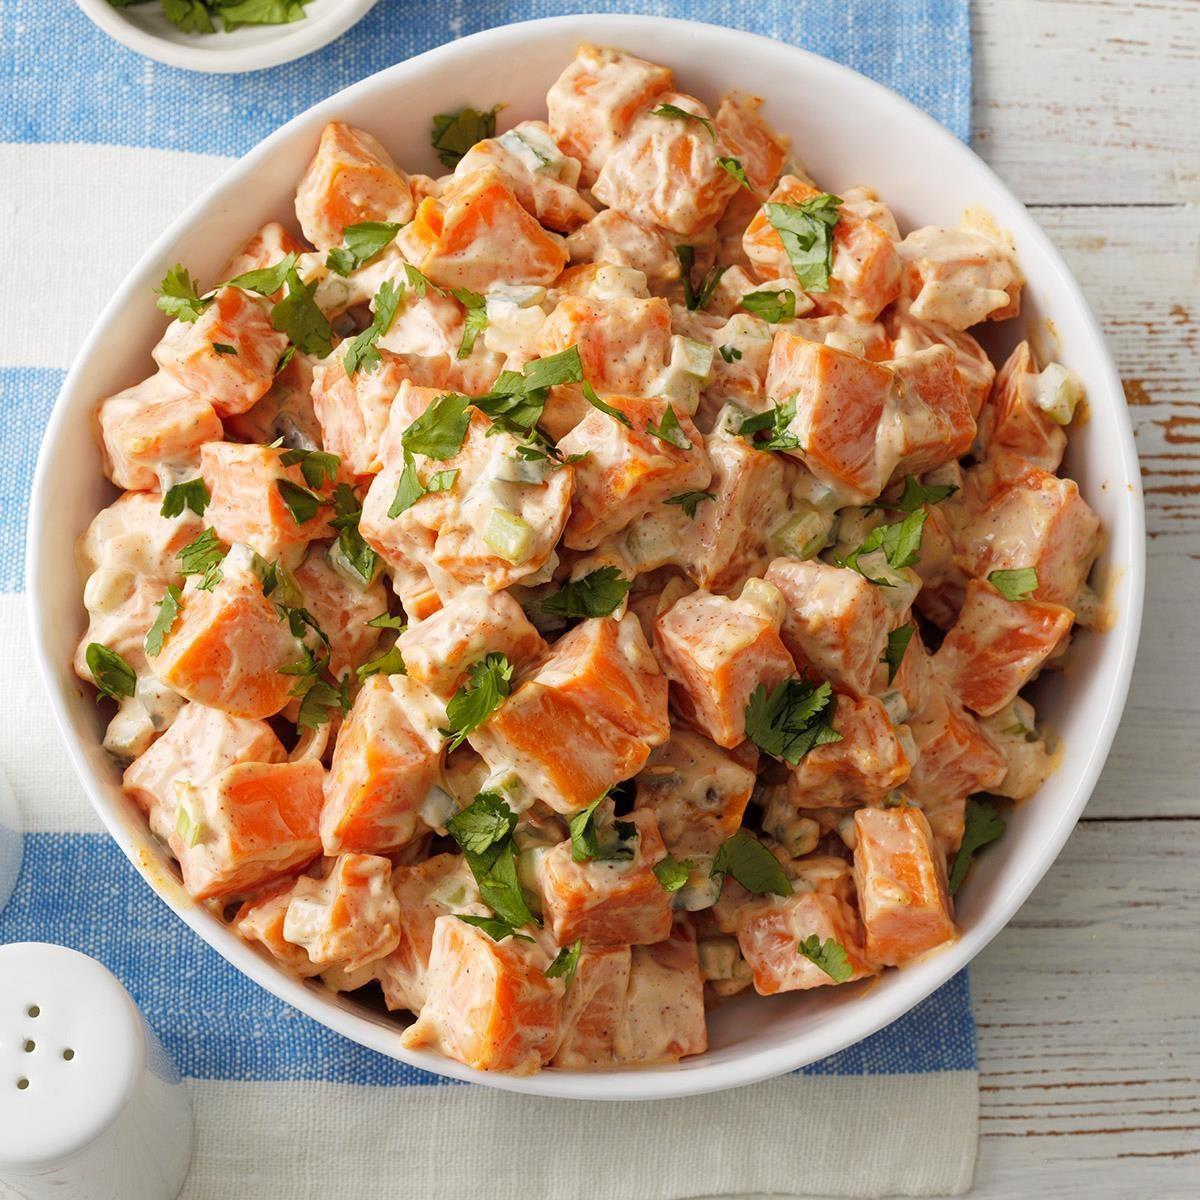 Ohio: Chipotle Sweet Potato Salad